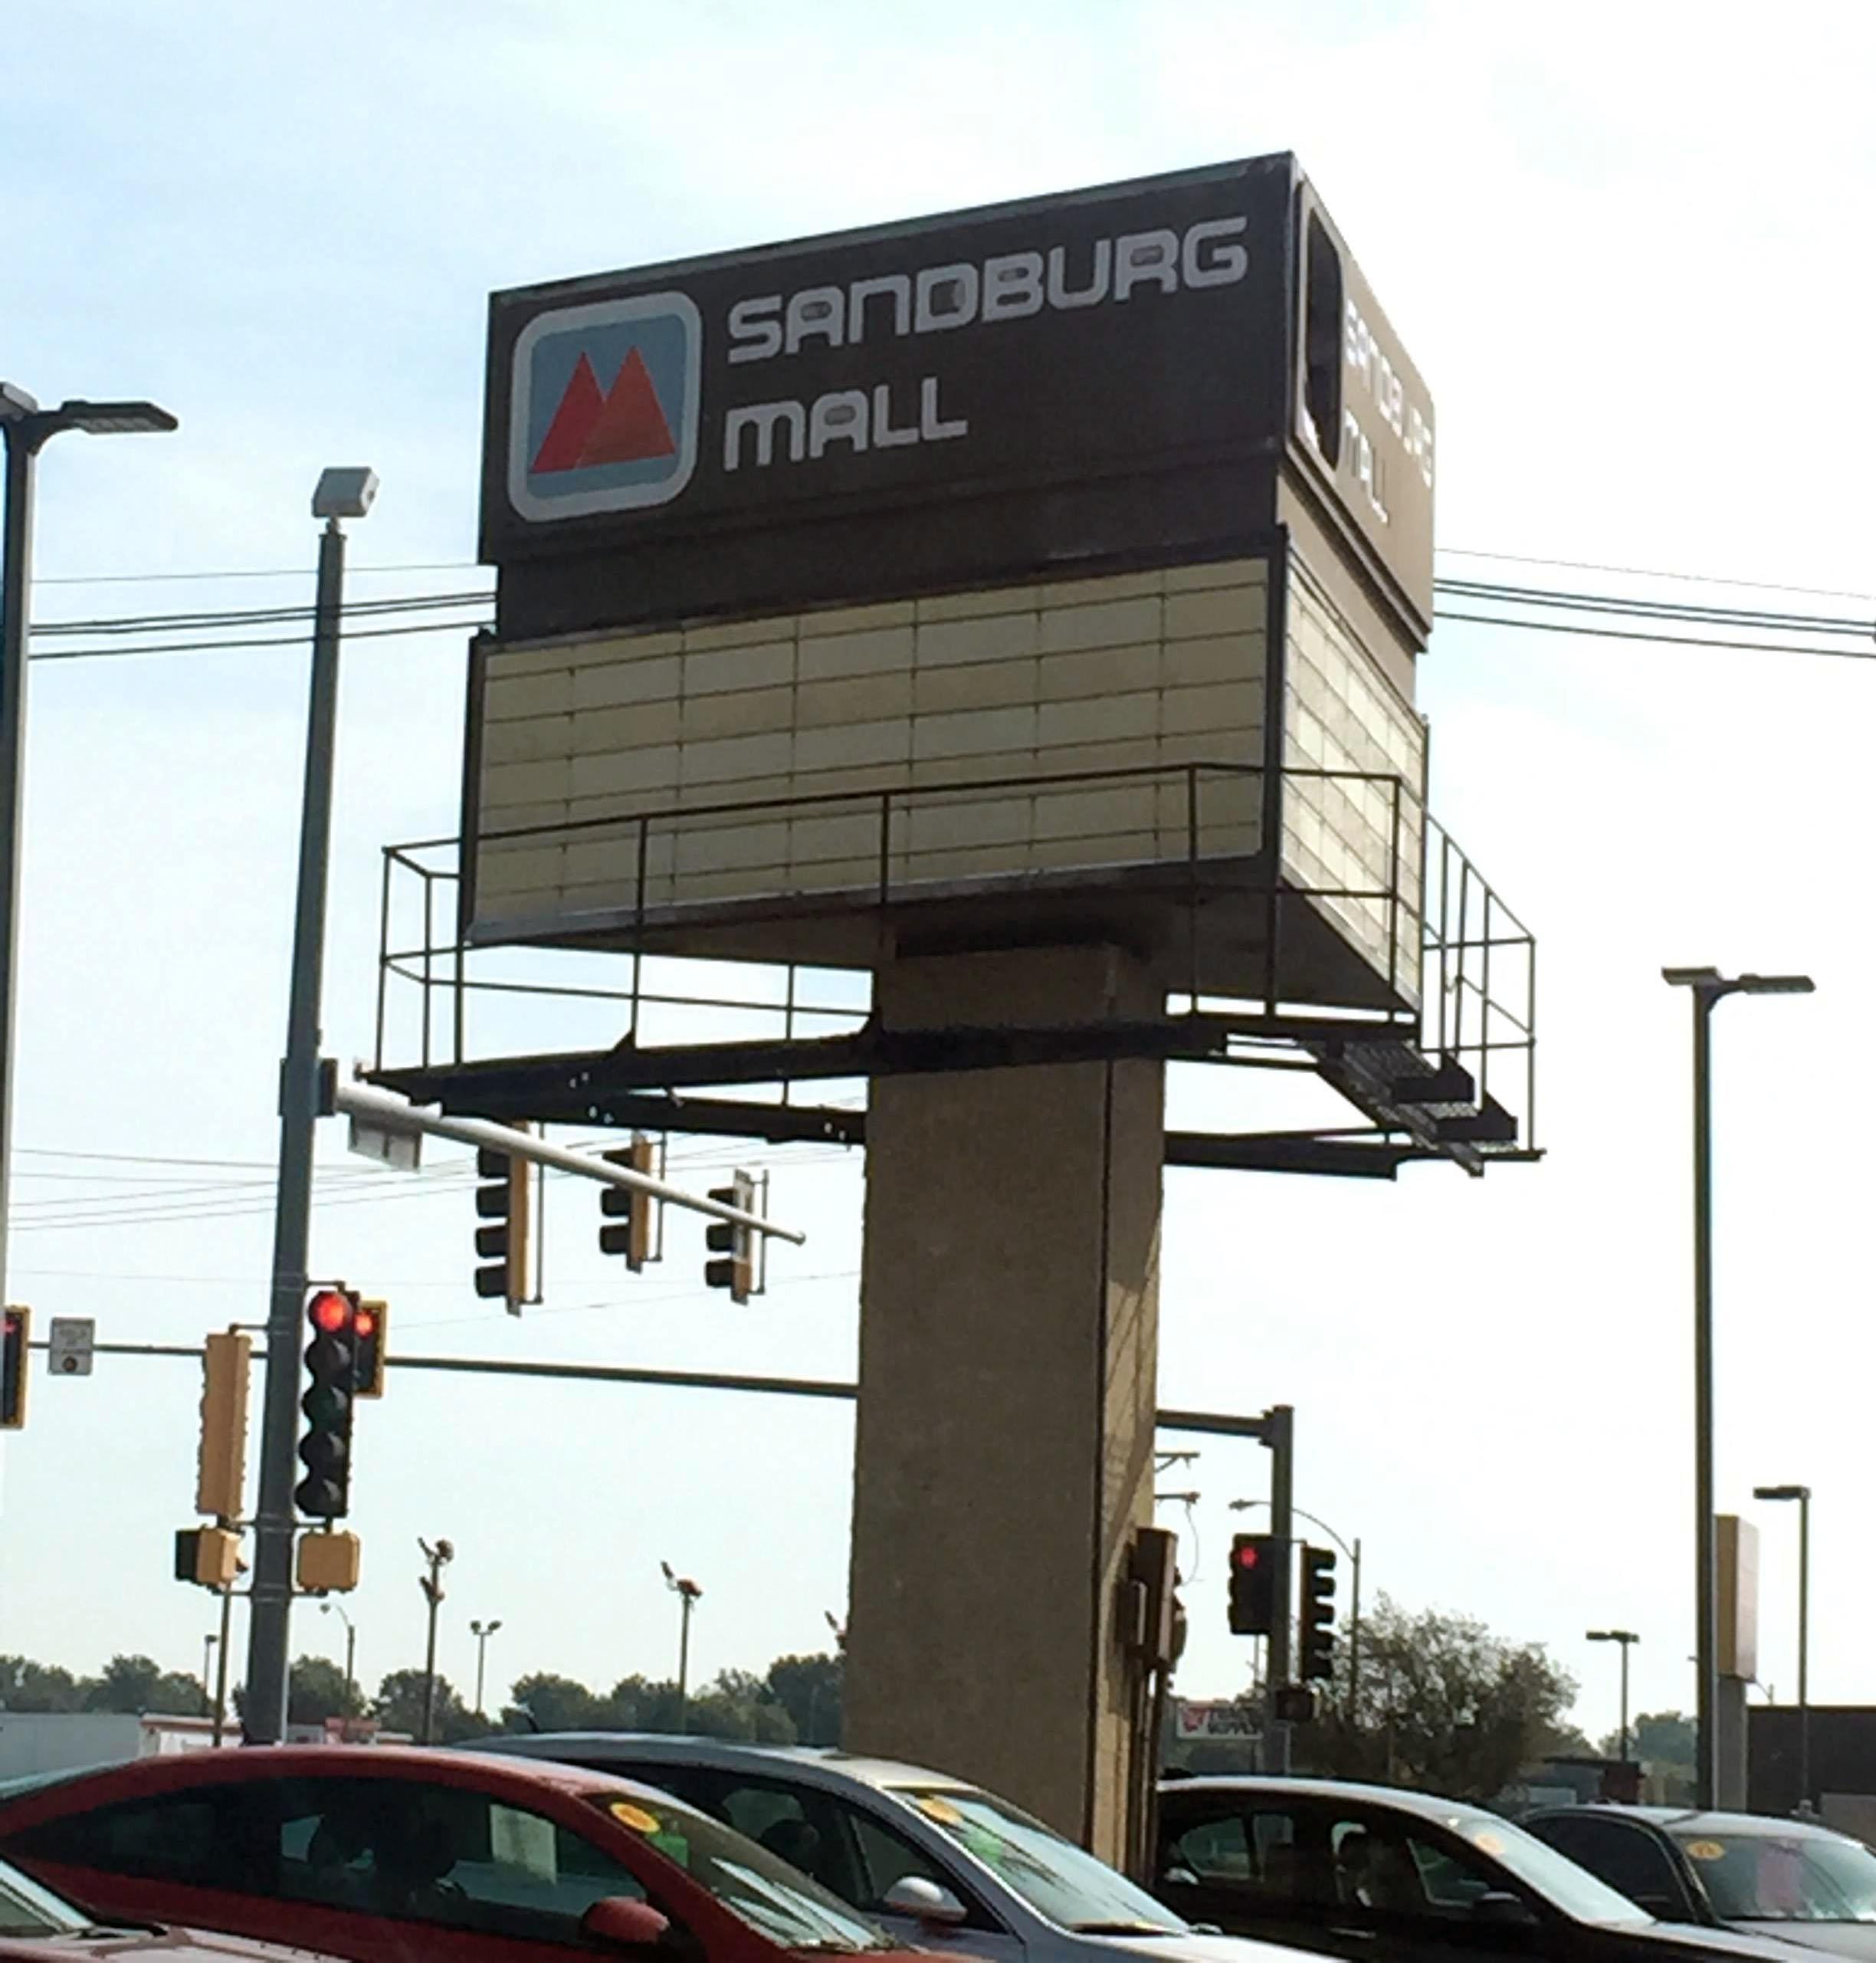 Sandburg Mall - Wikipedia